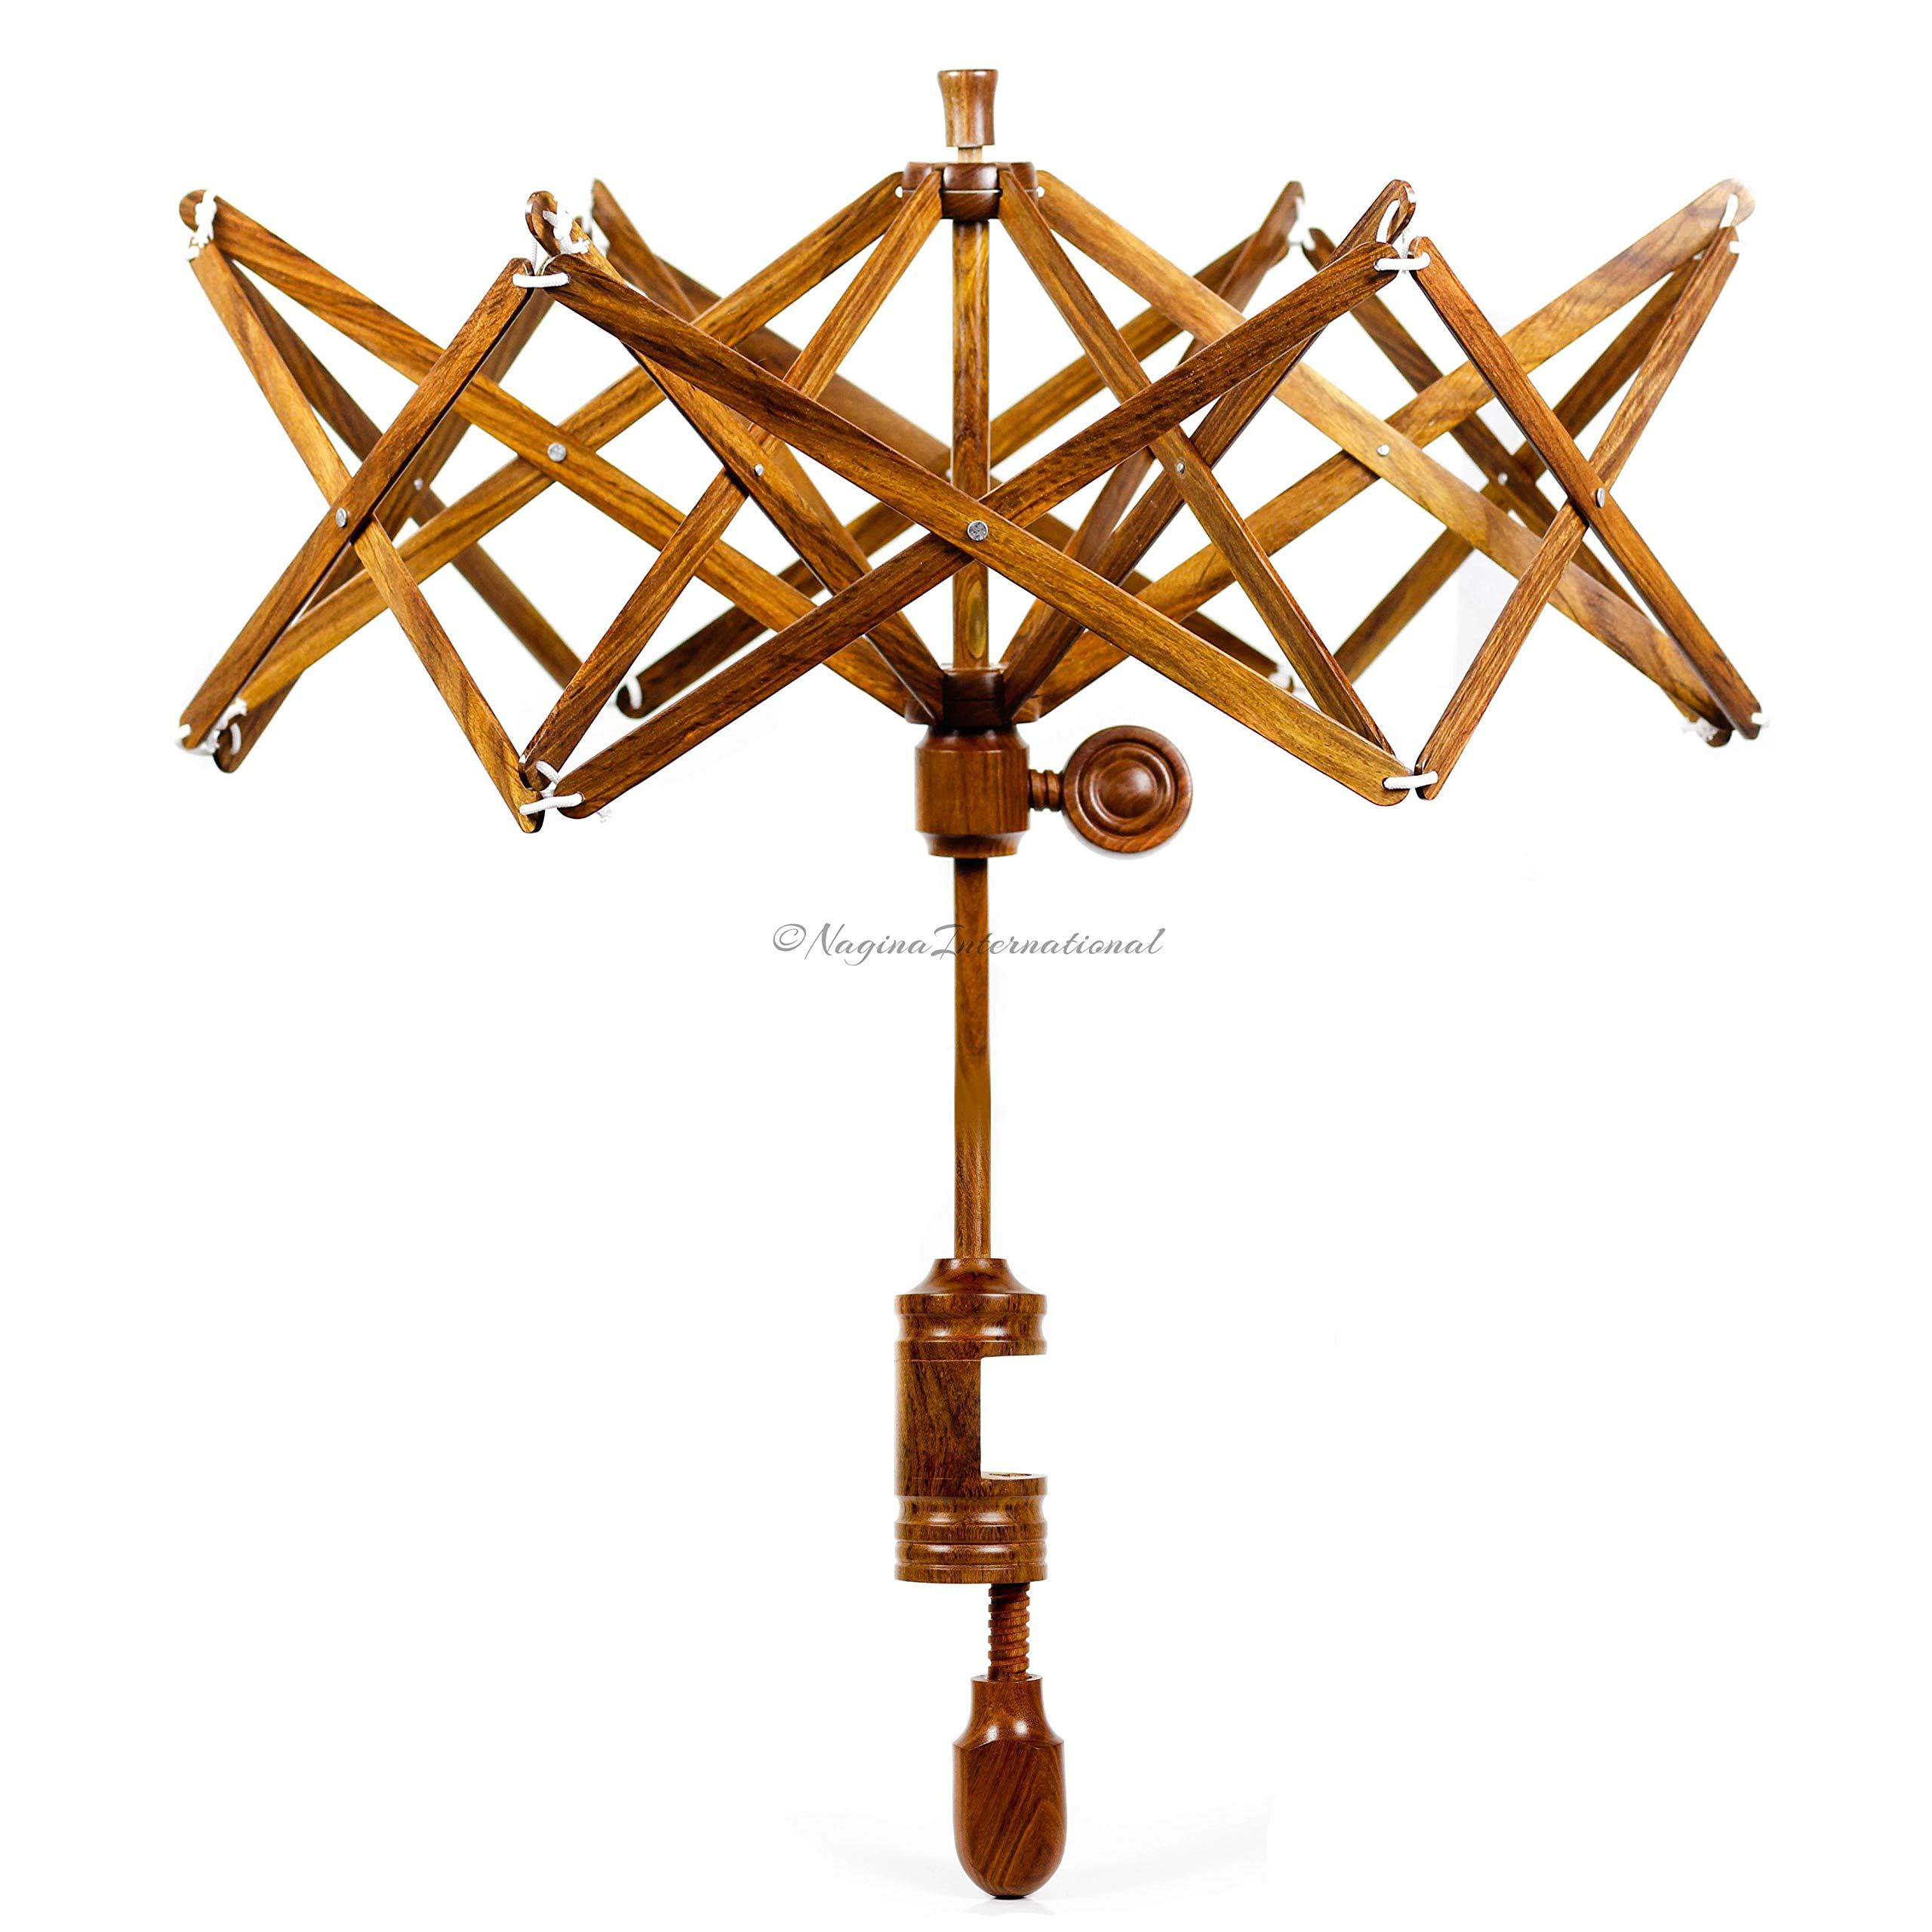 Nagina International's Yarn Swift Umbrella Table Top Yarn Winder | Hand Operated Ball Winder Holder | Knitting Tool for Swift Winding Lines, Laces Yarns & Fiber (Rosewood, X-Large)